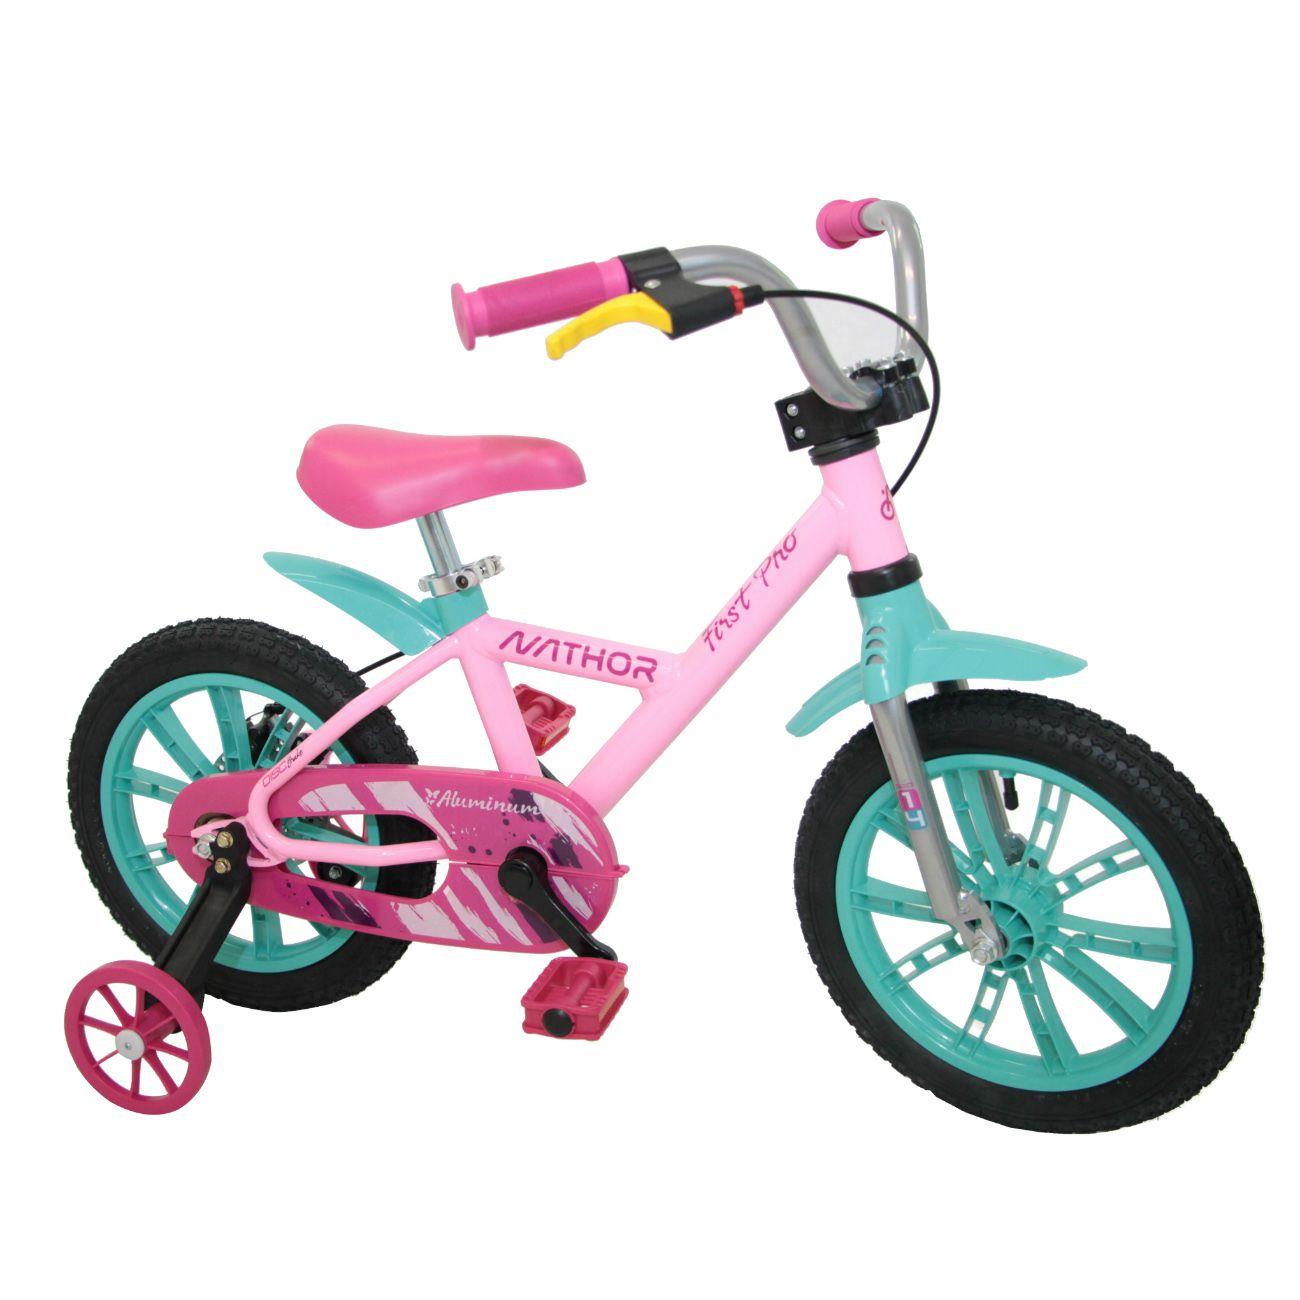 Bicicleta Aro 14 - First Pro - Menina - Nathor